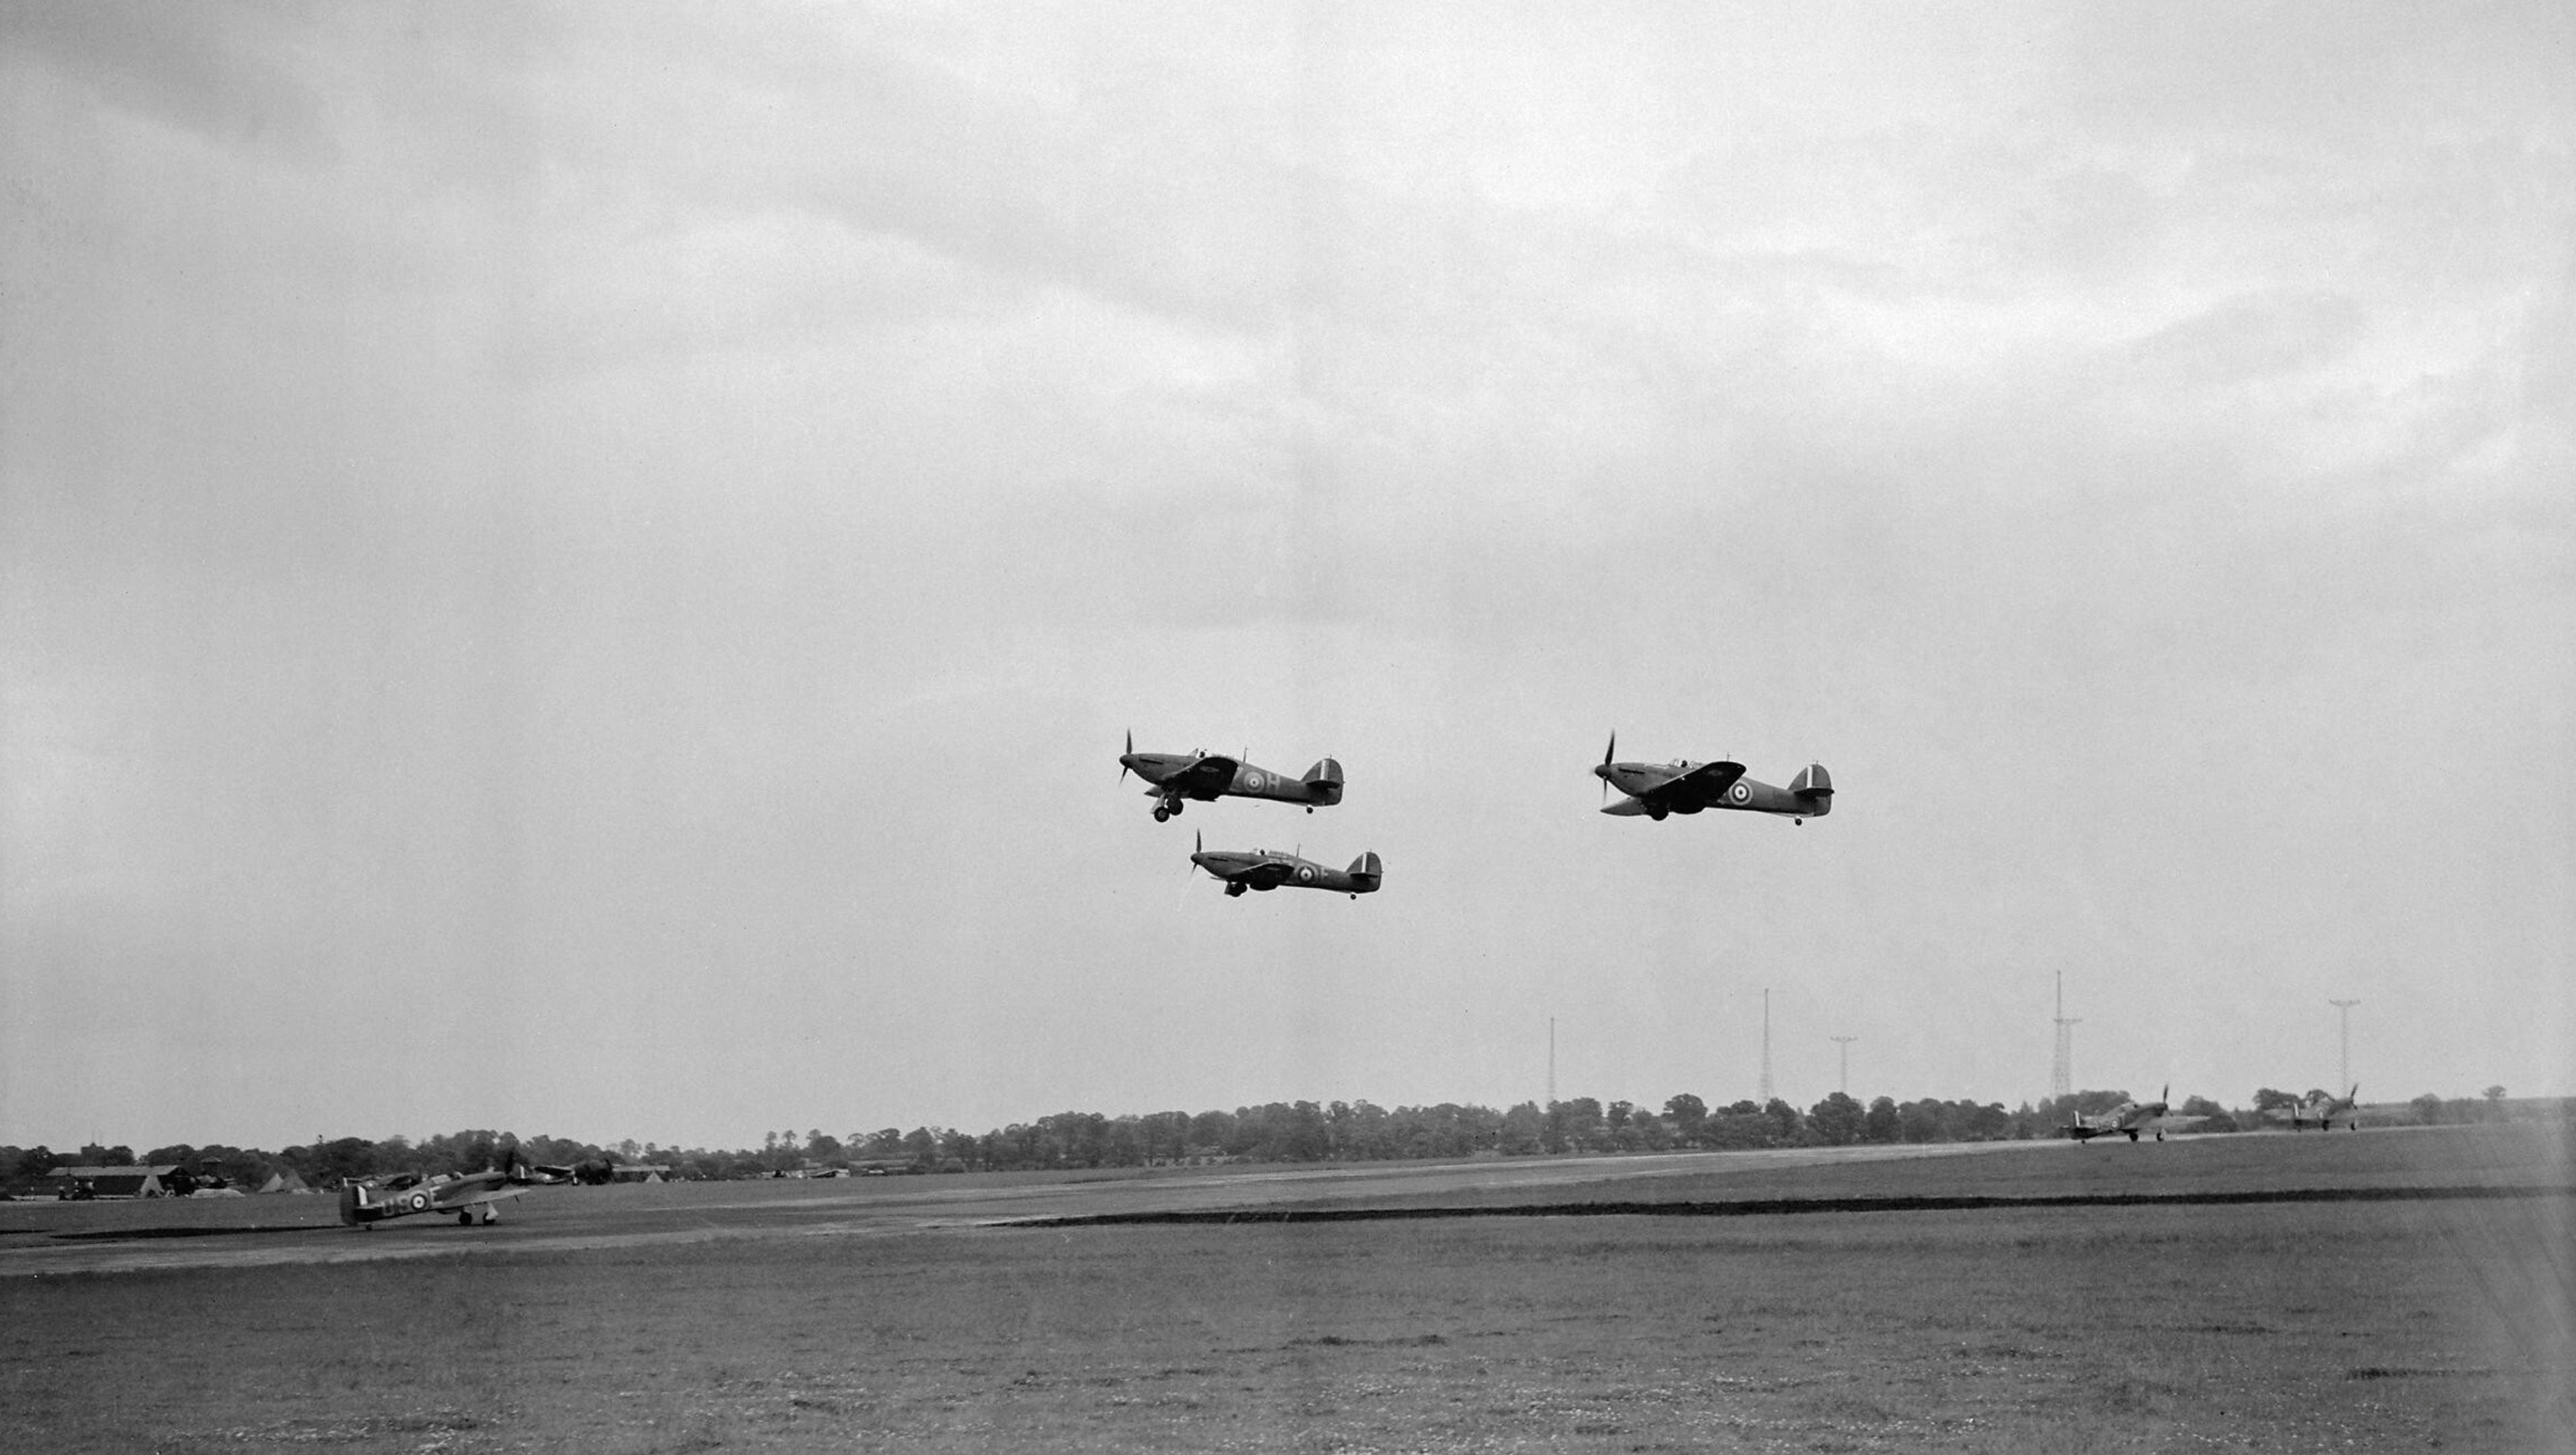 Hurricane I RAF 56Sqn USE UST taxing at North Weald Essex IWM CH162